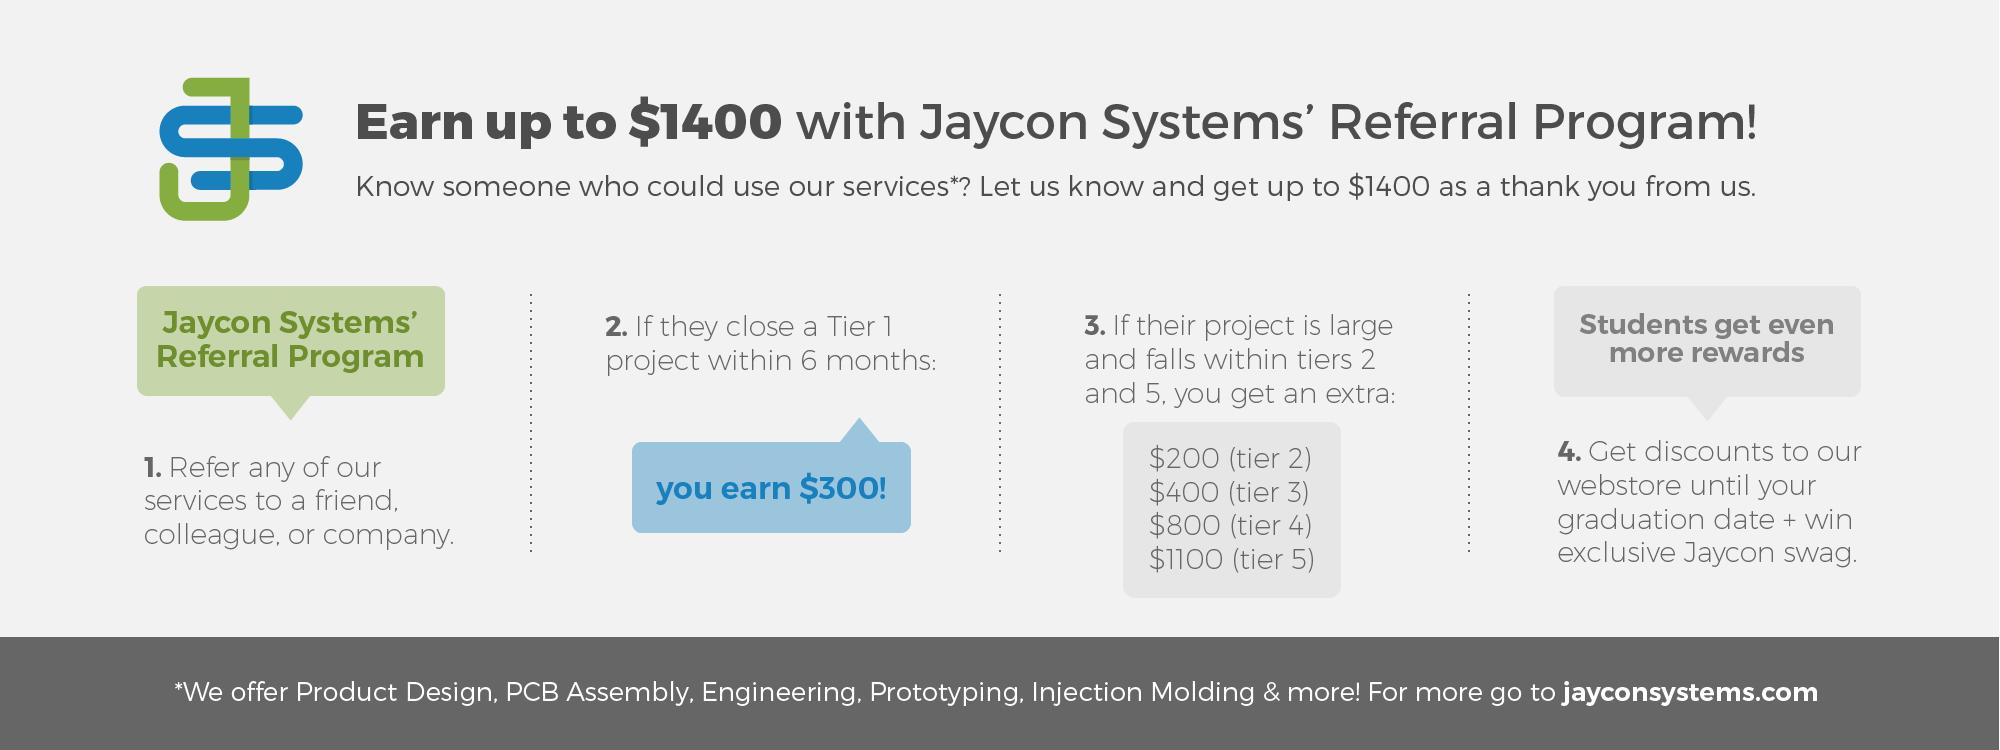 Jaycon Systems Introduces Referral Program